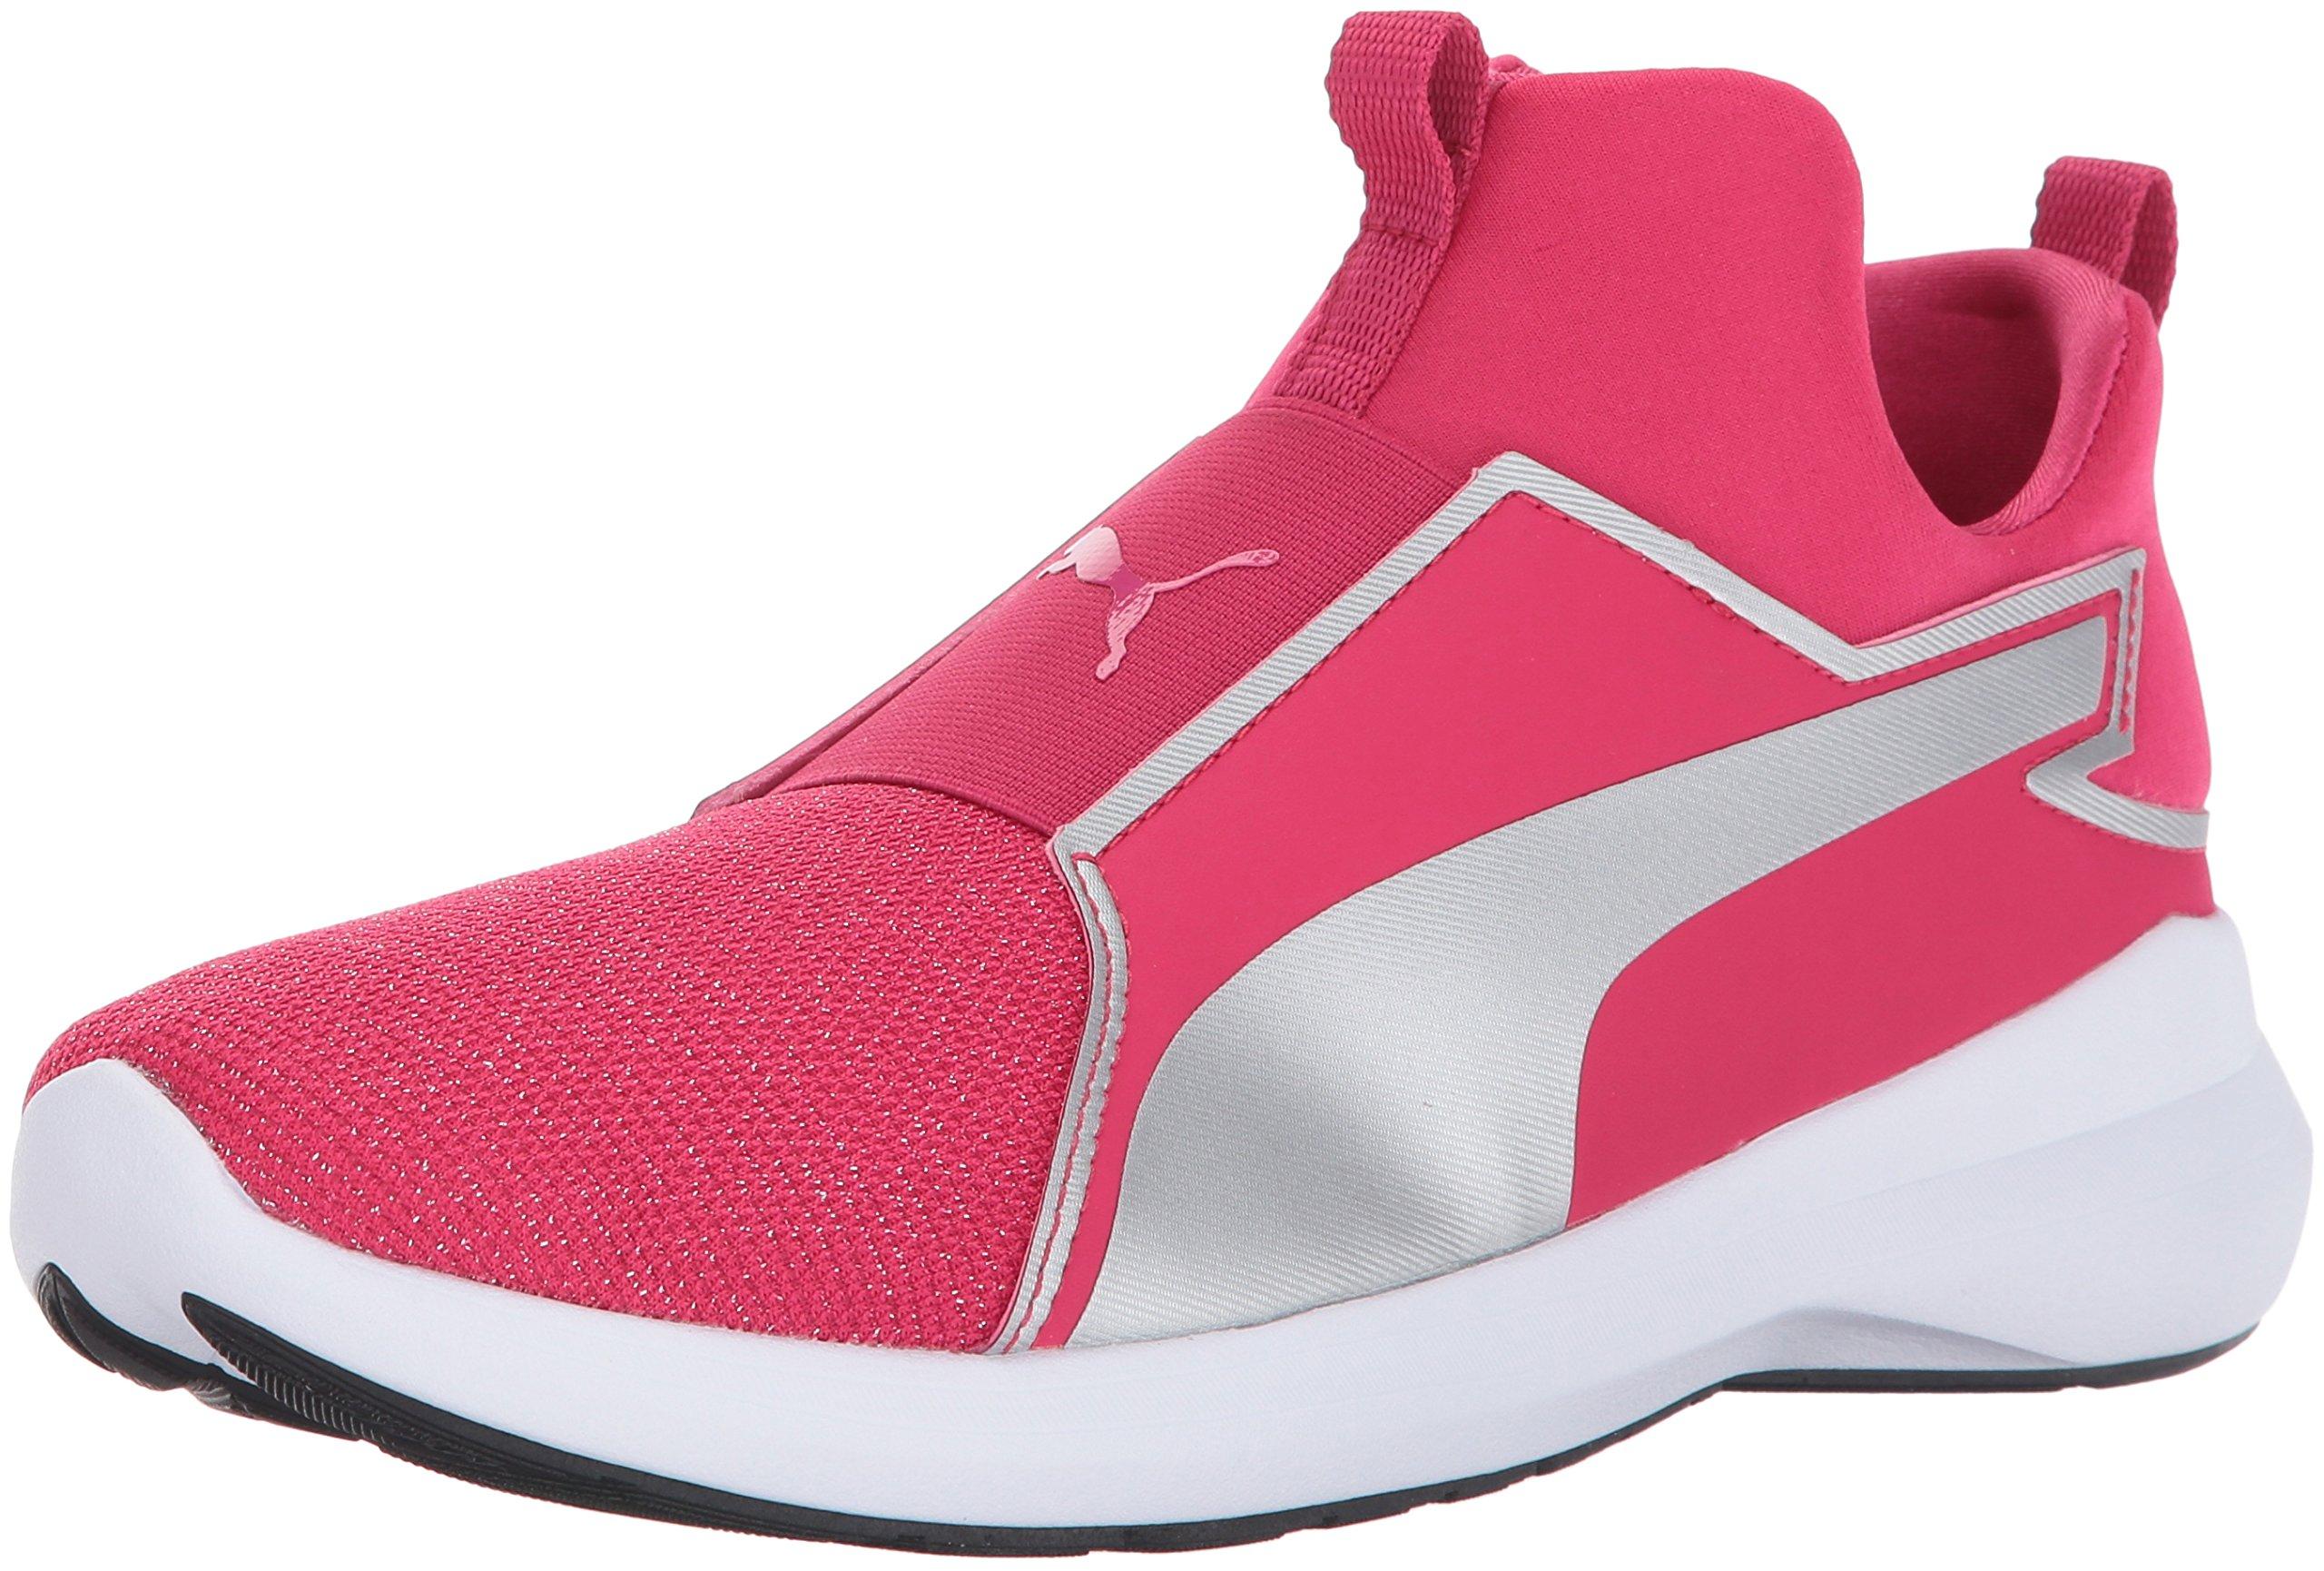 PUMA Unisex-Kids Rebel Mid Gleam Sneaker, Love Potion Silver, 11 M US Little Kid